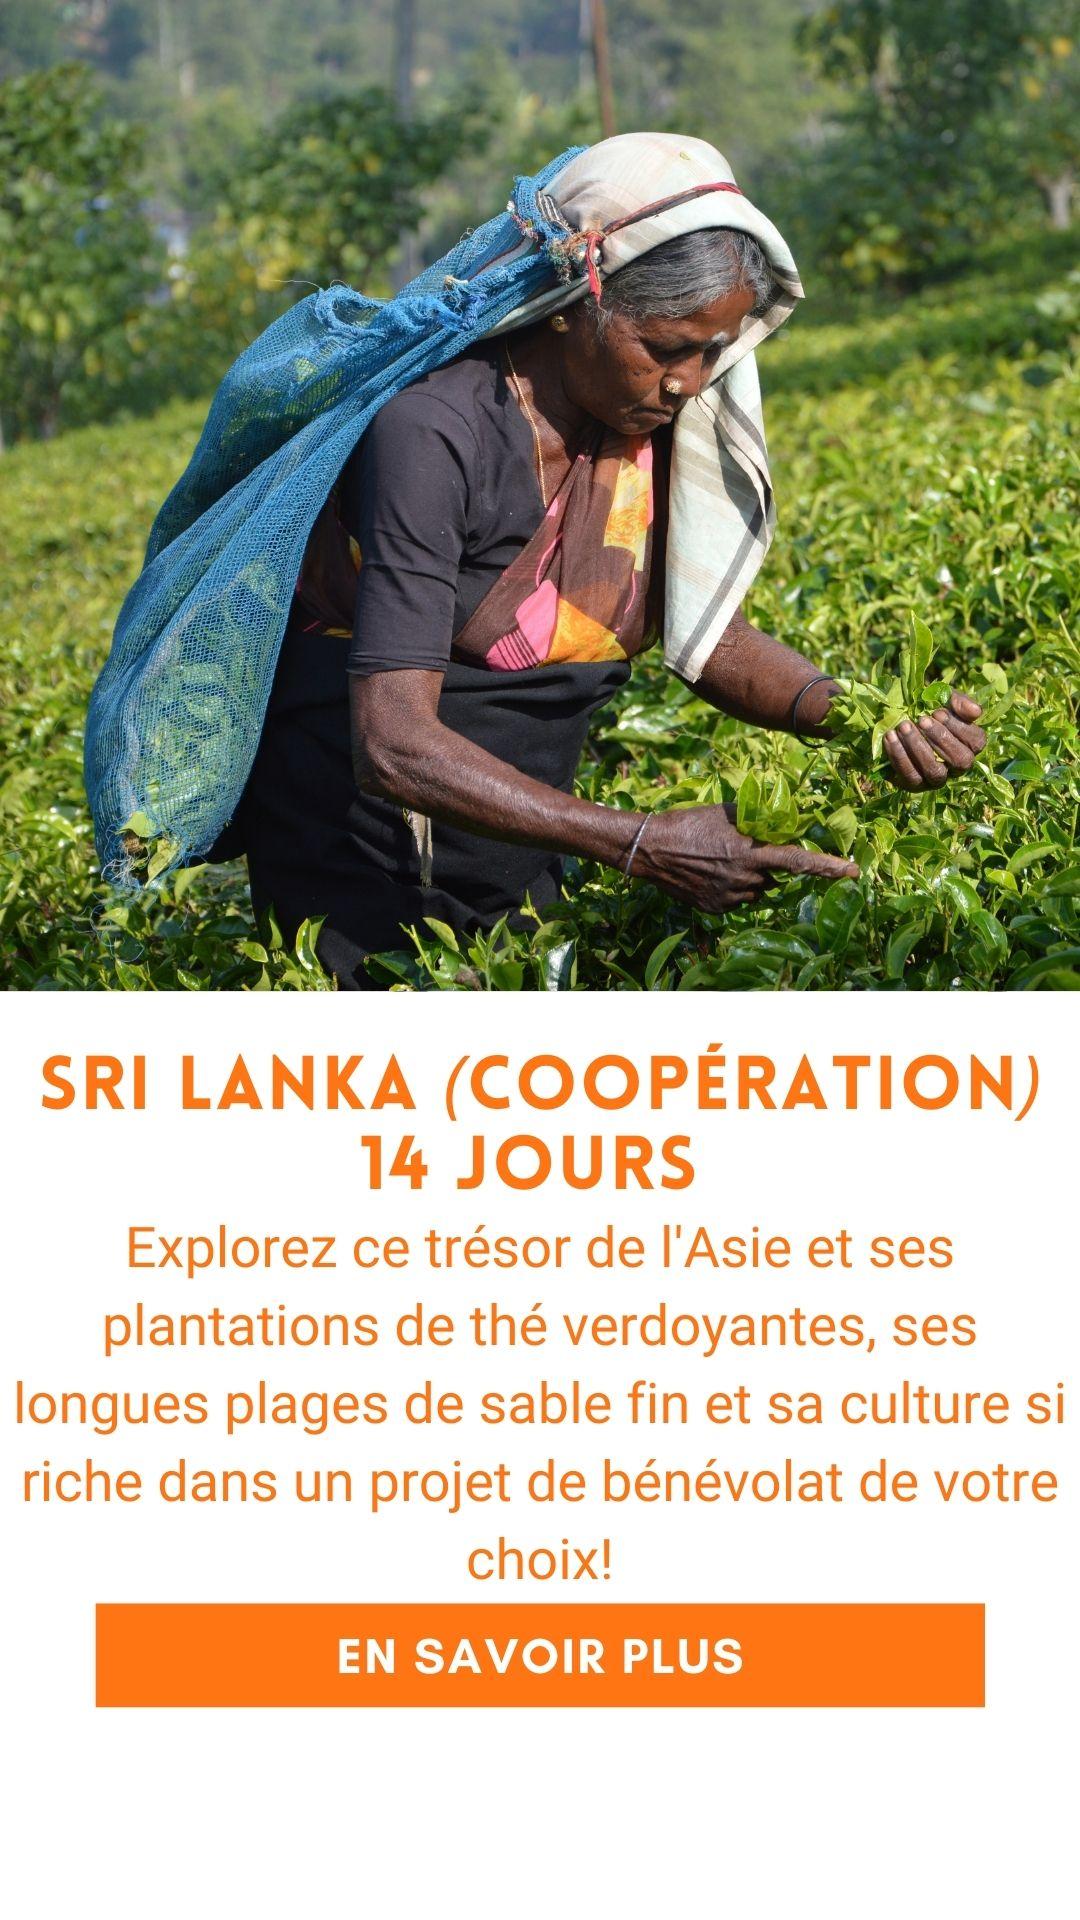 Voyage organisé au Sri Lanka (voyage humanitaire)